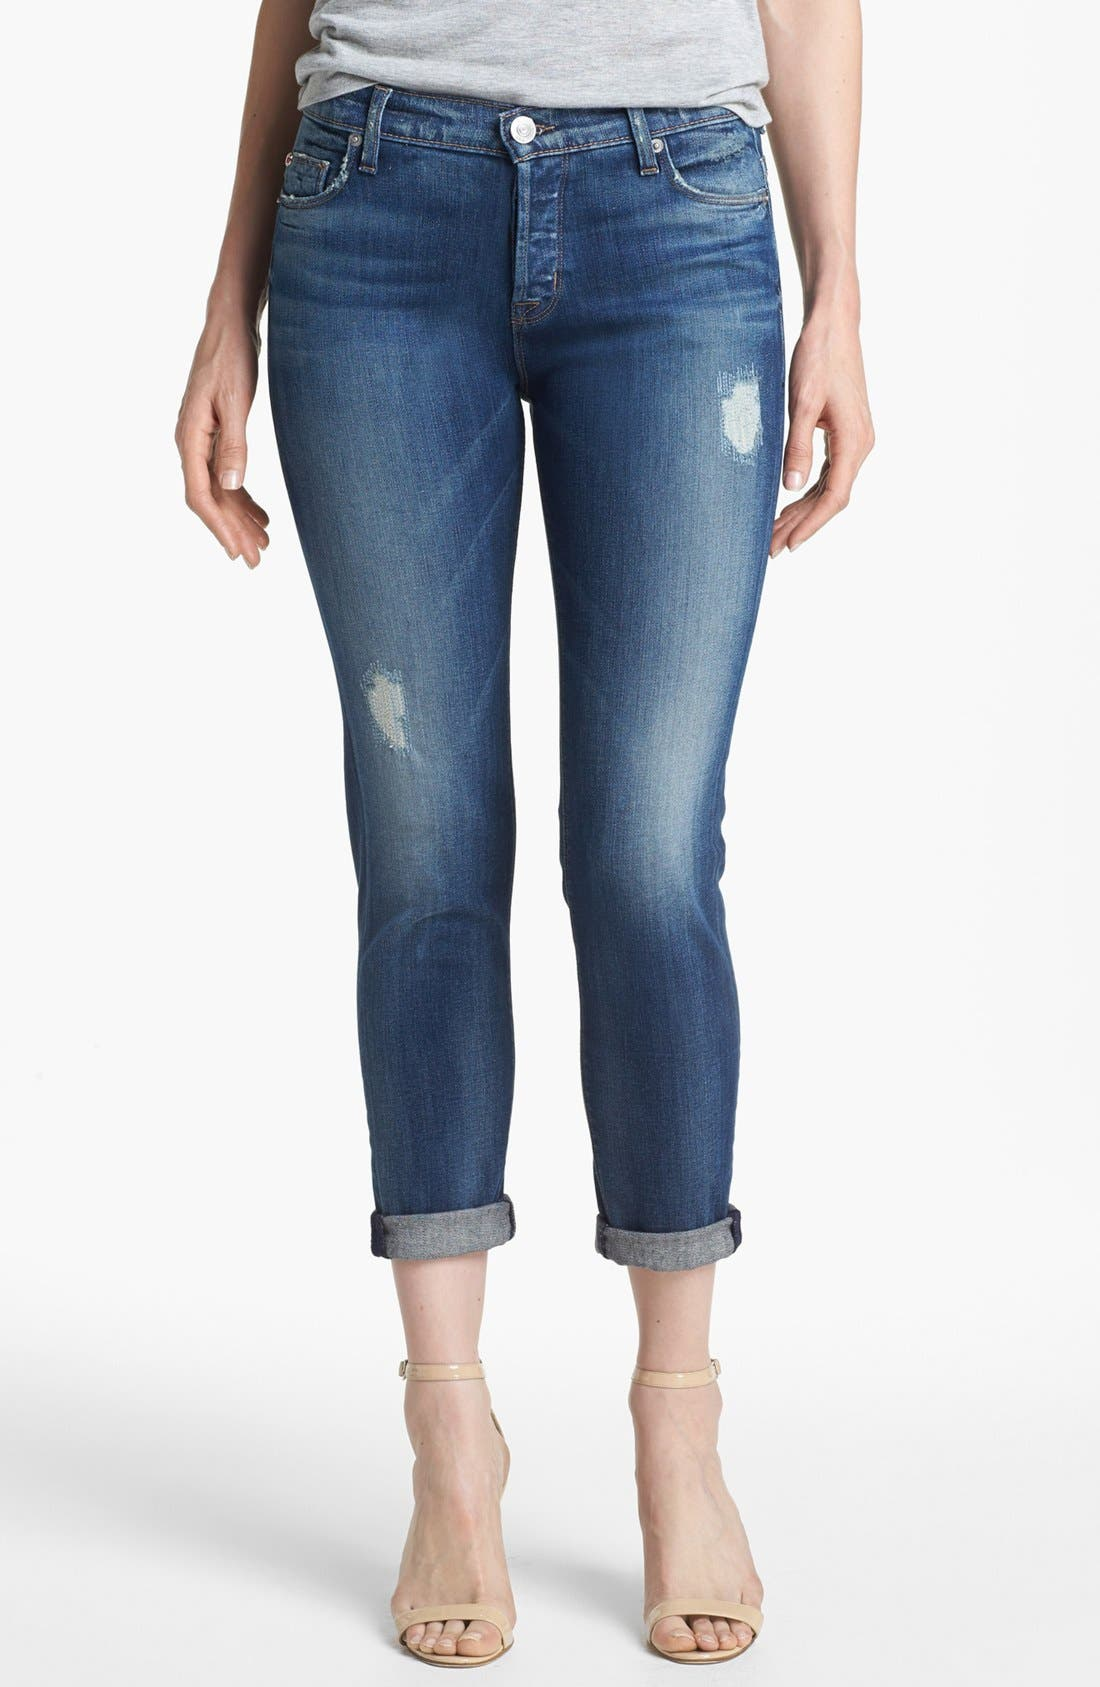 Main Image - Hudson Jeans 'Leigh' Distressed Boyfriend Jeans (Wilbur)